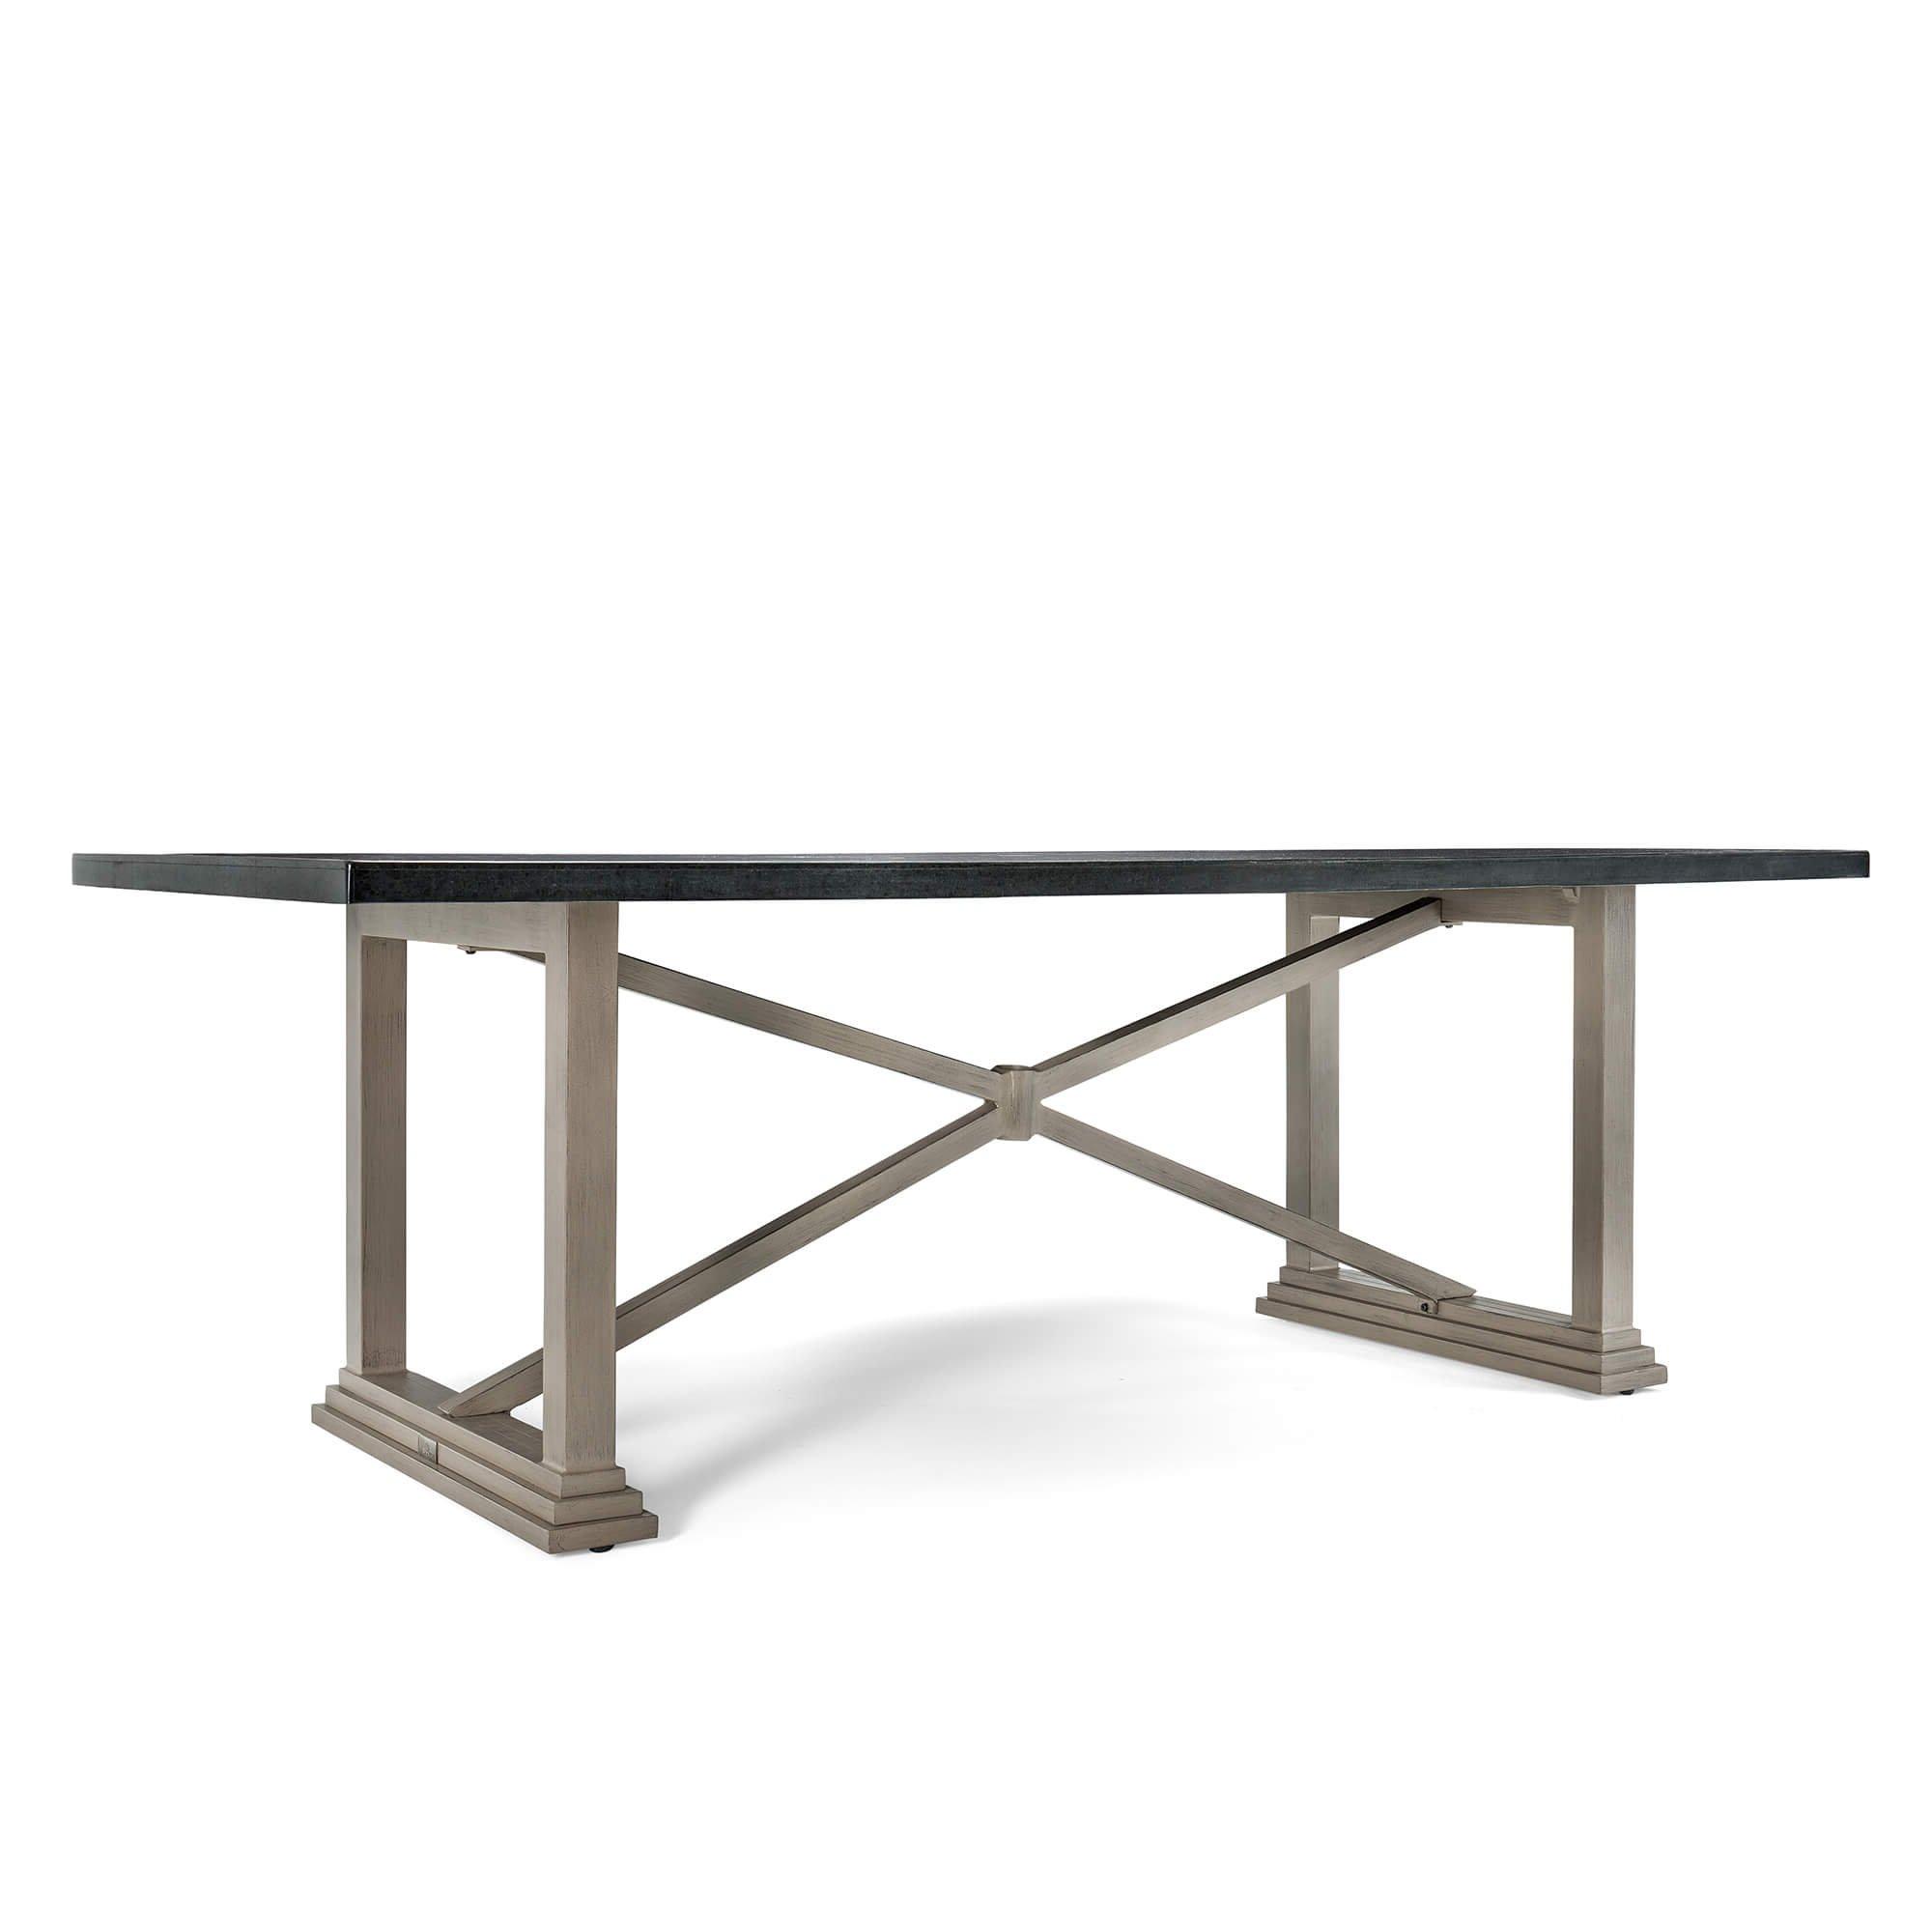 Blue Oak Outdoor Saylor Patio Furniture Stone Rectangular Natural Stone Top Dining Table